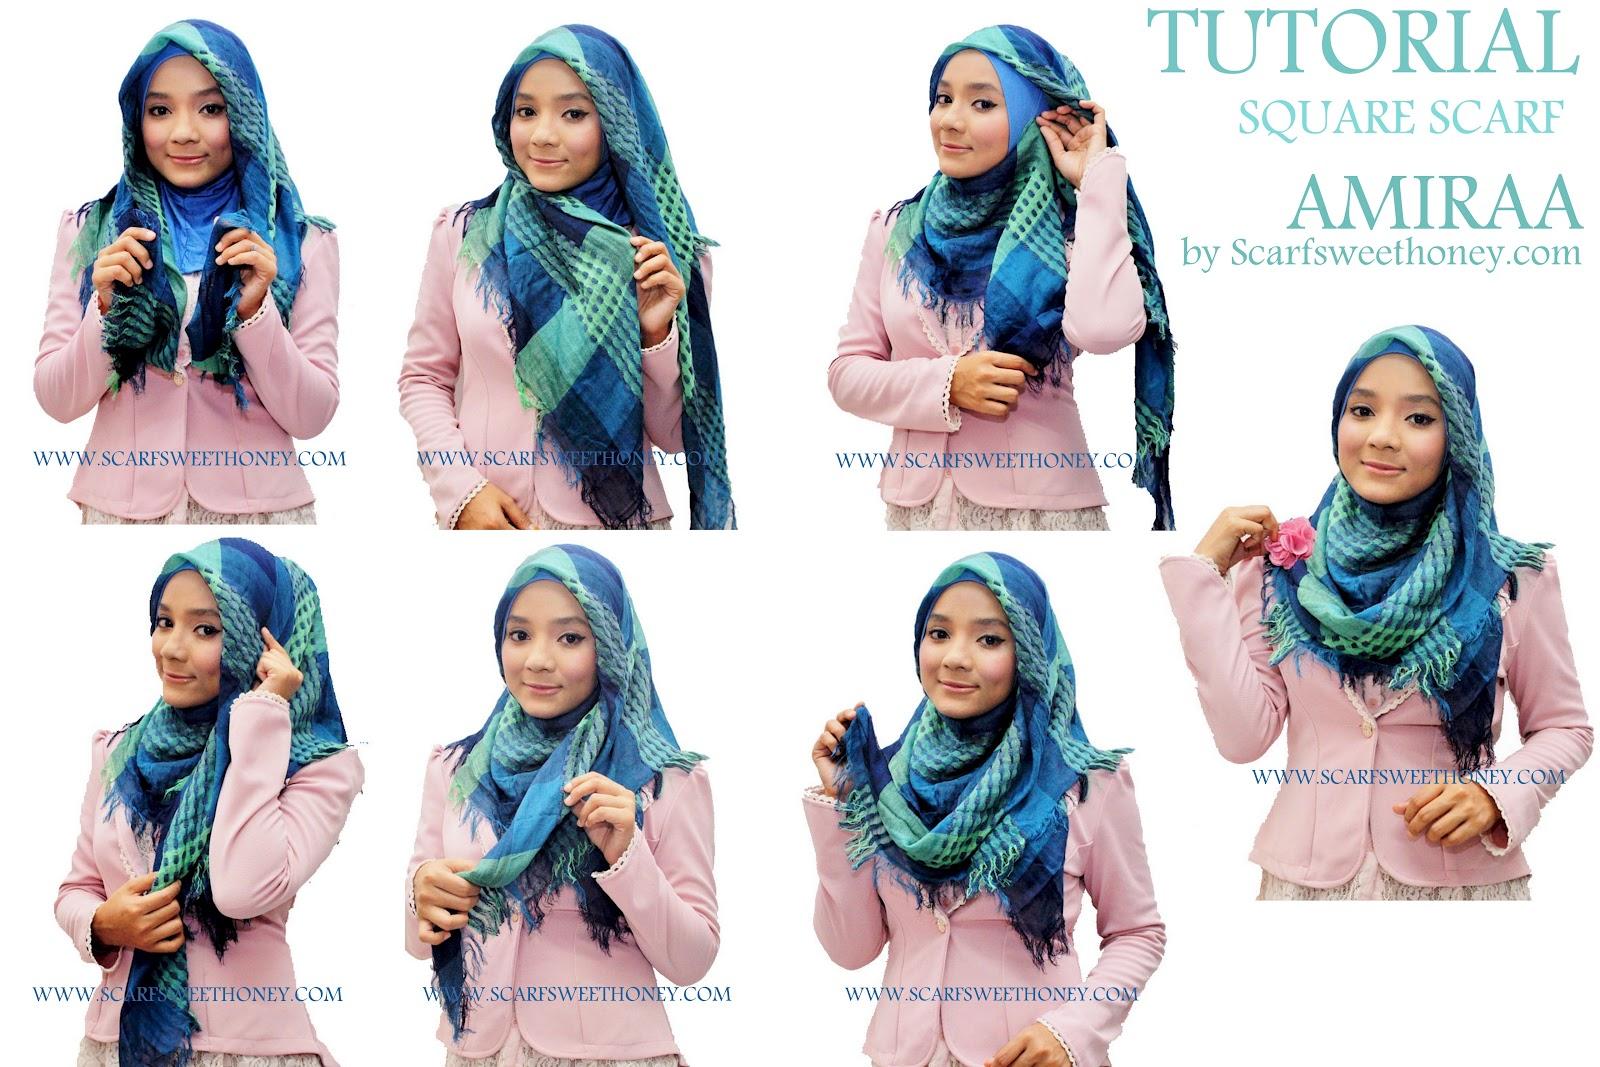 Tutorial Model Kerudung Terbaru Jilbab Modern Hijab 2015 ...